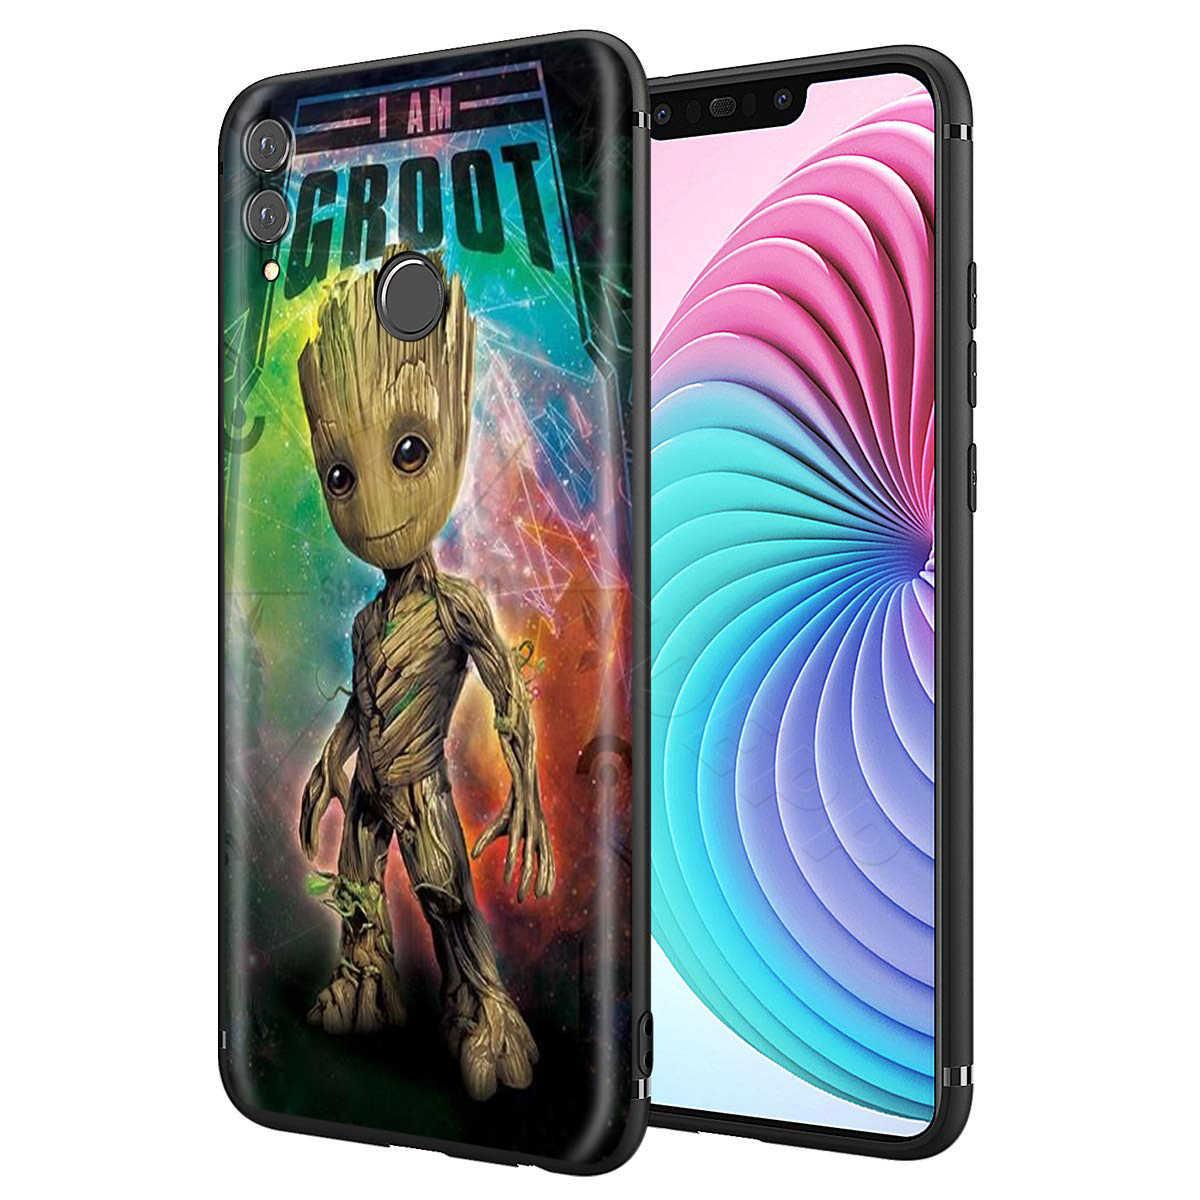 Webbedepp ガーディアン Groot 驚異ケース huawei 社 P8 P9 P10 P20 P30 Lite Pro の P スマート Z 2019 2019 ミニ